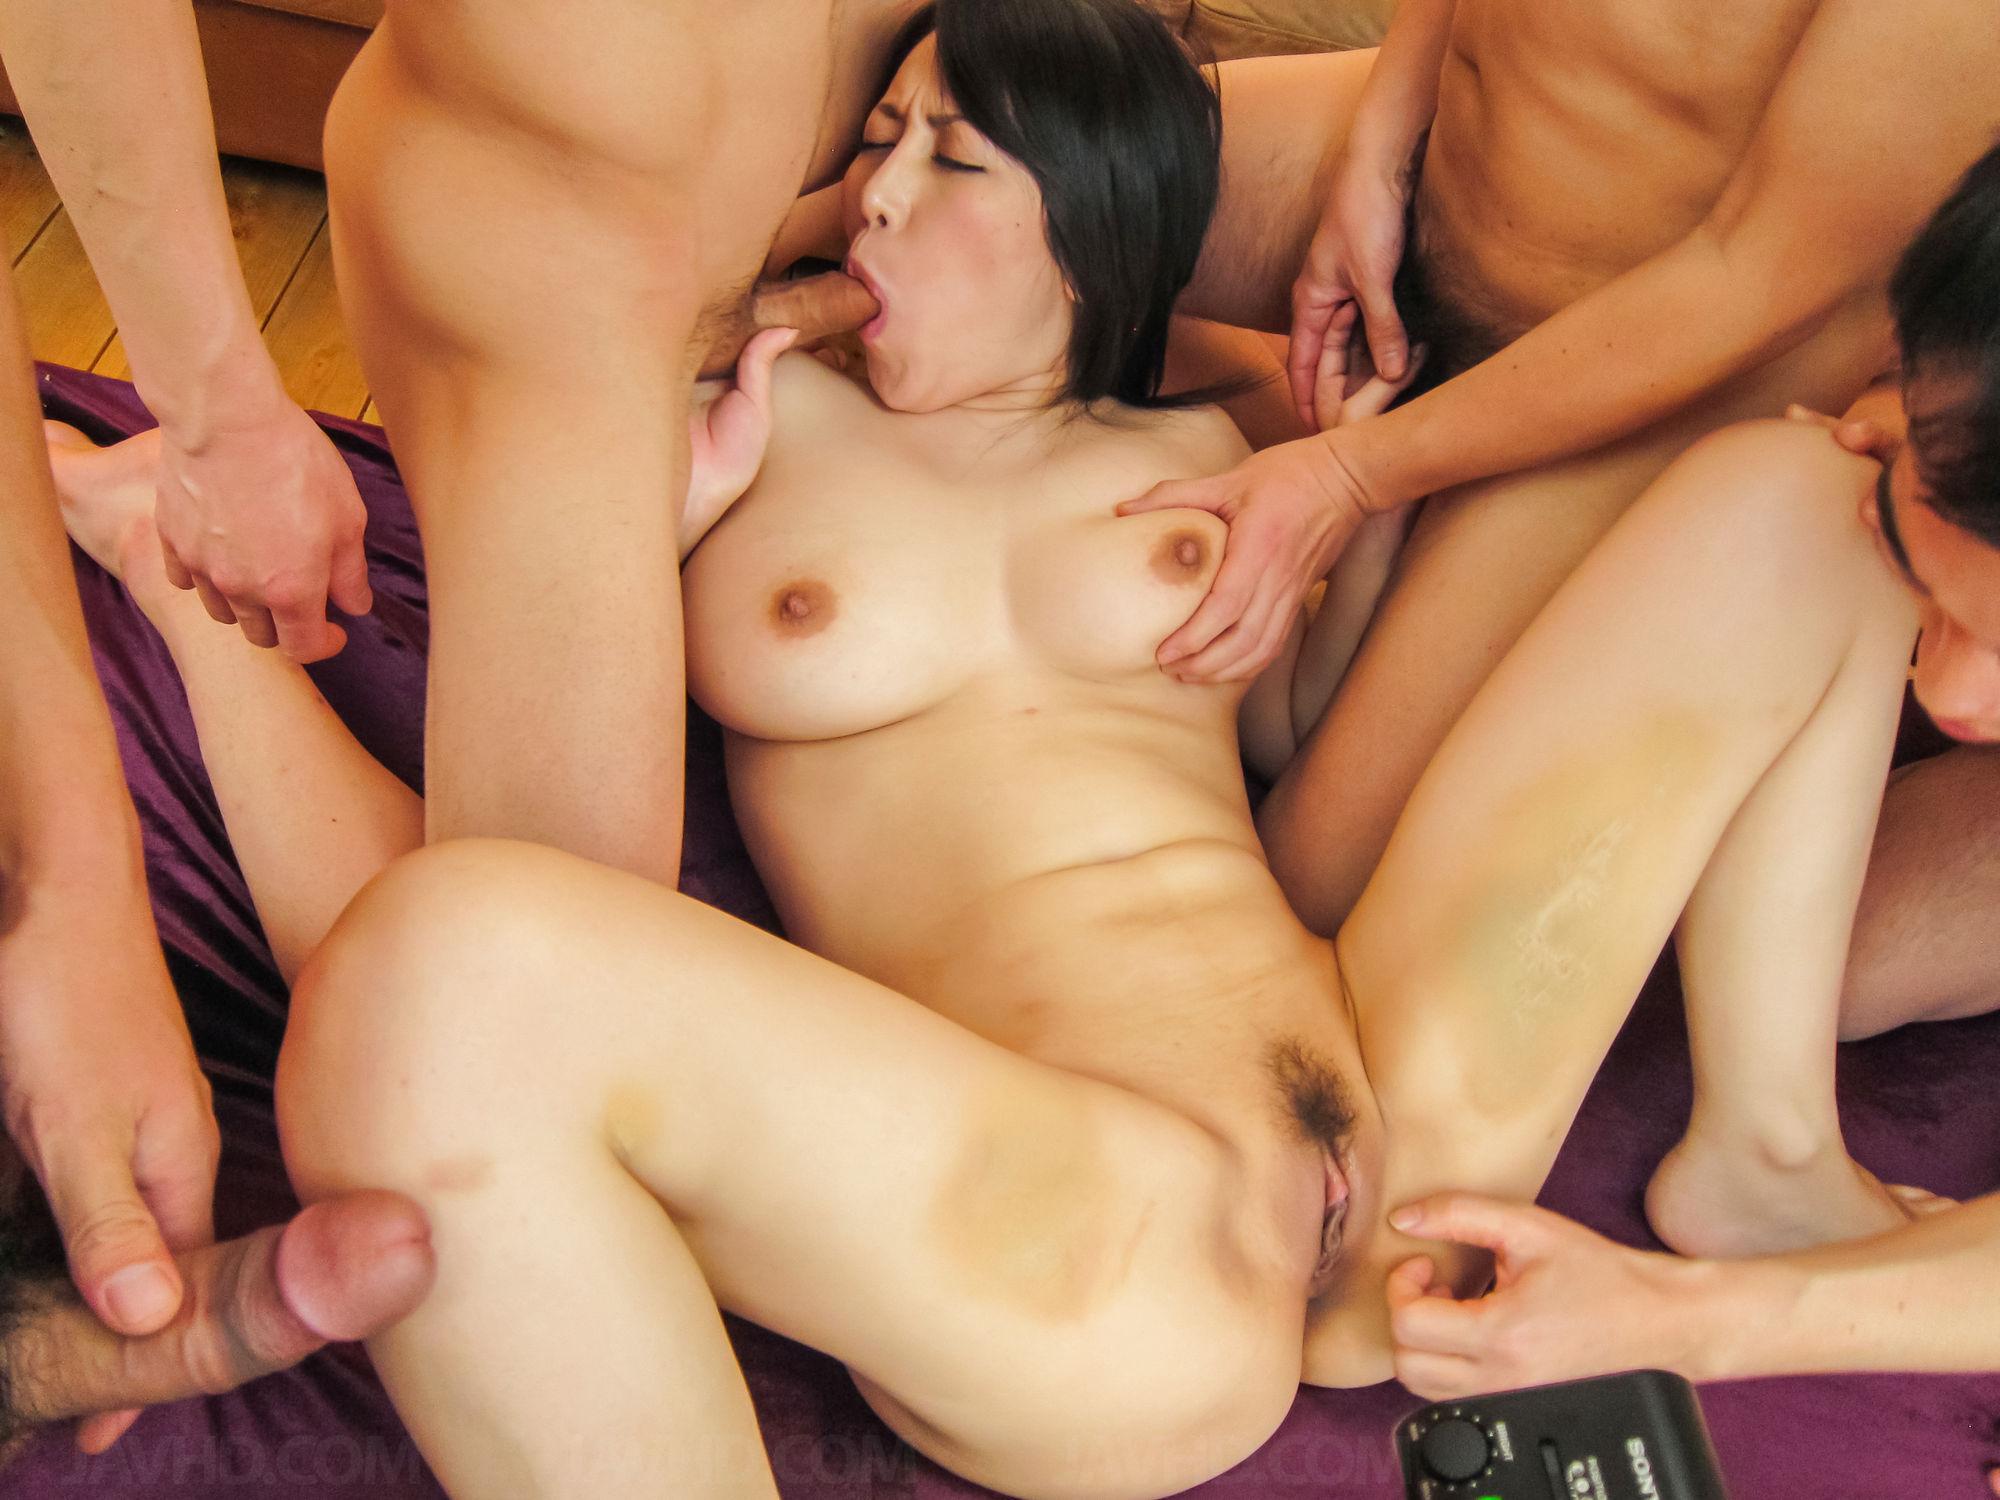 escort girl review norge porno